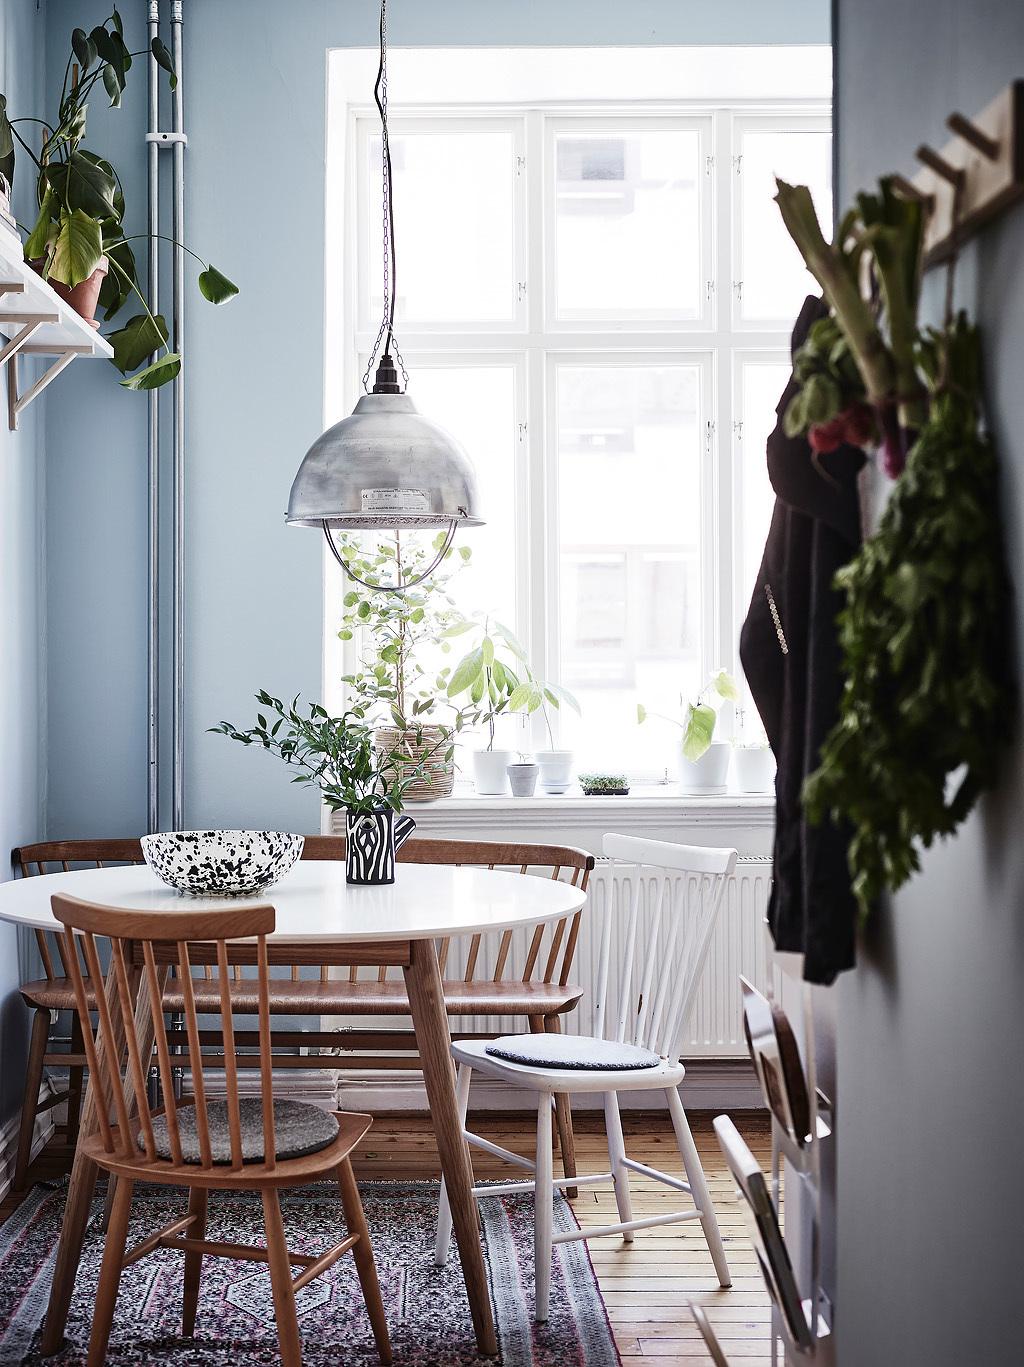 Amenajare cu multe plante de interior ntr o garsonier de for Plante de interior